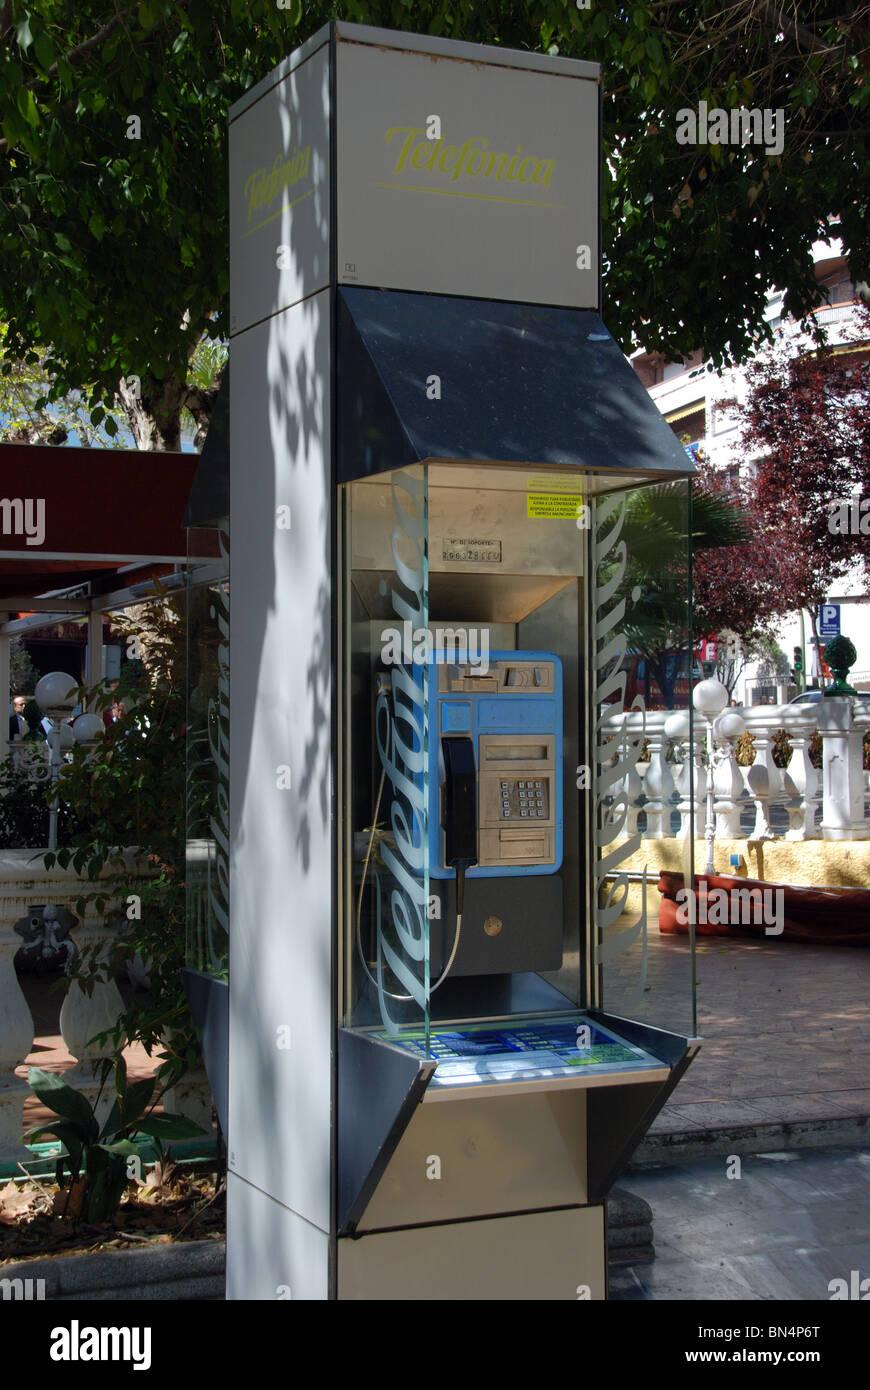 Public telephone kiosk, Marbella, Costa del Sol, Malaga Province, Andalucia, Spain, Western Europe. - Stock Image